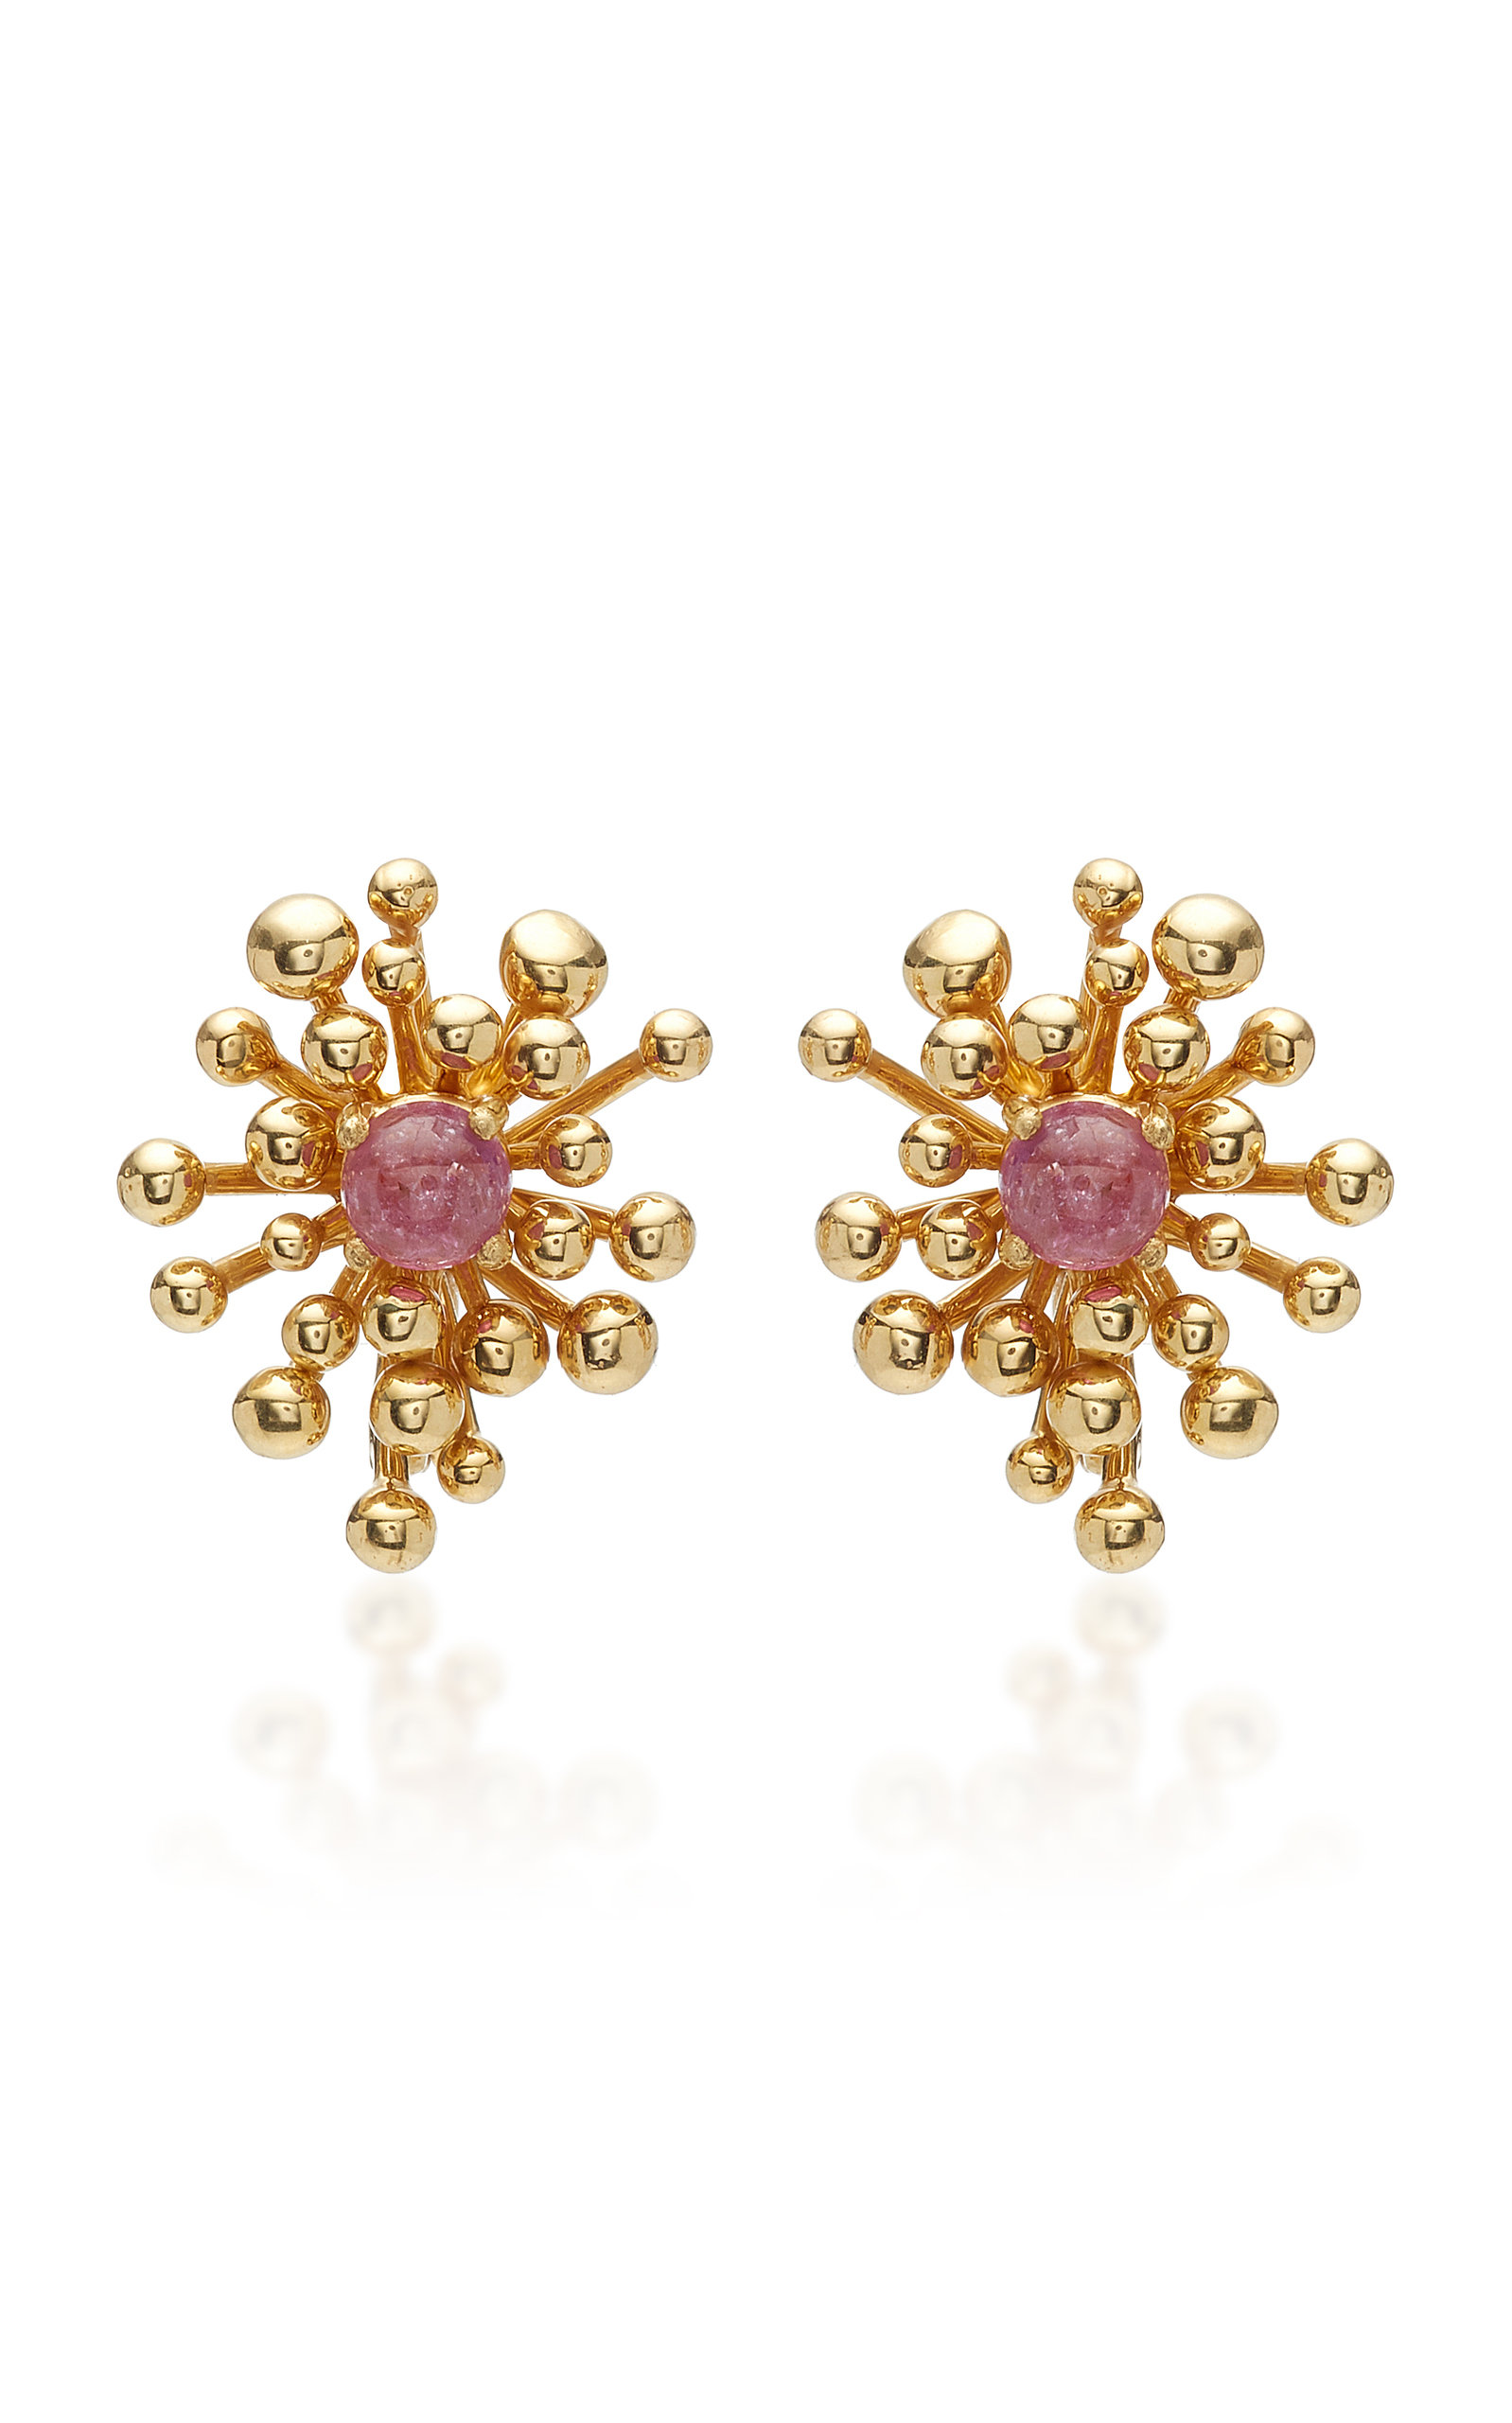 VRAM Nocturne 18K Gold Pink Sapphire Earrings